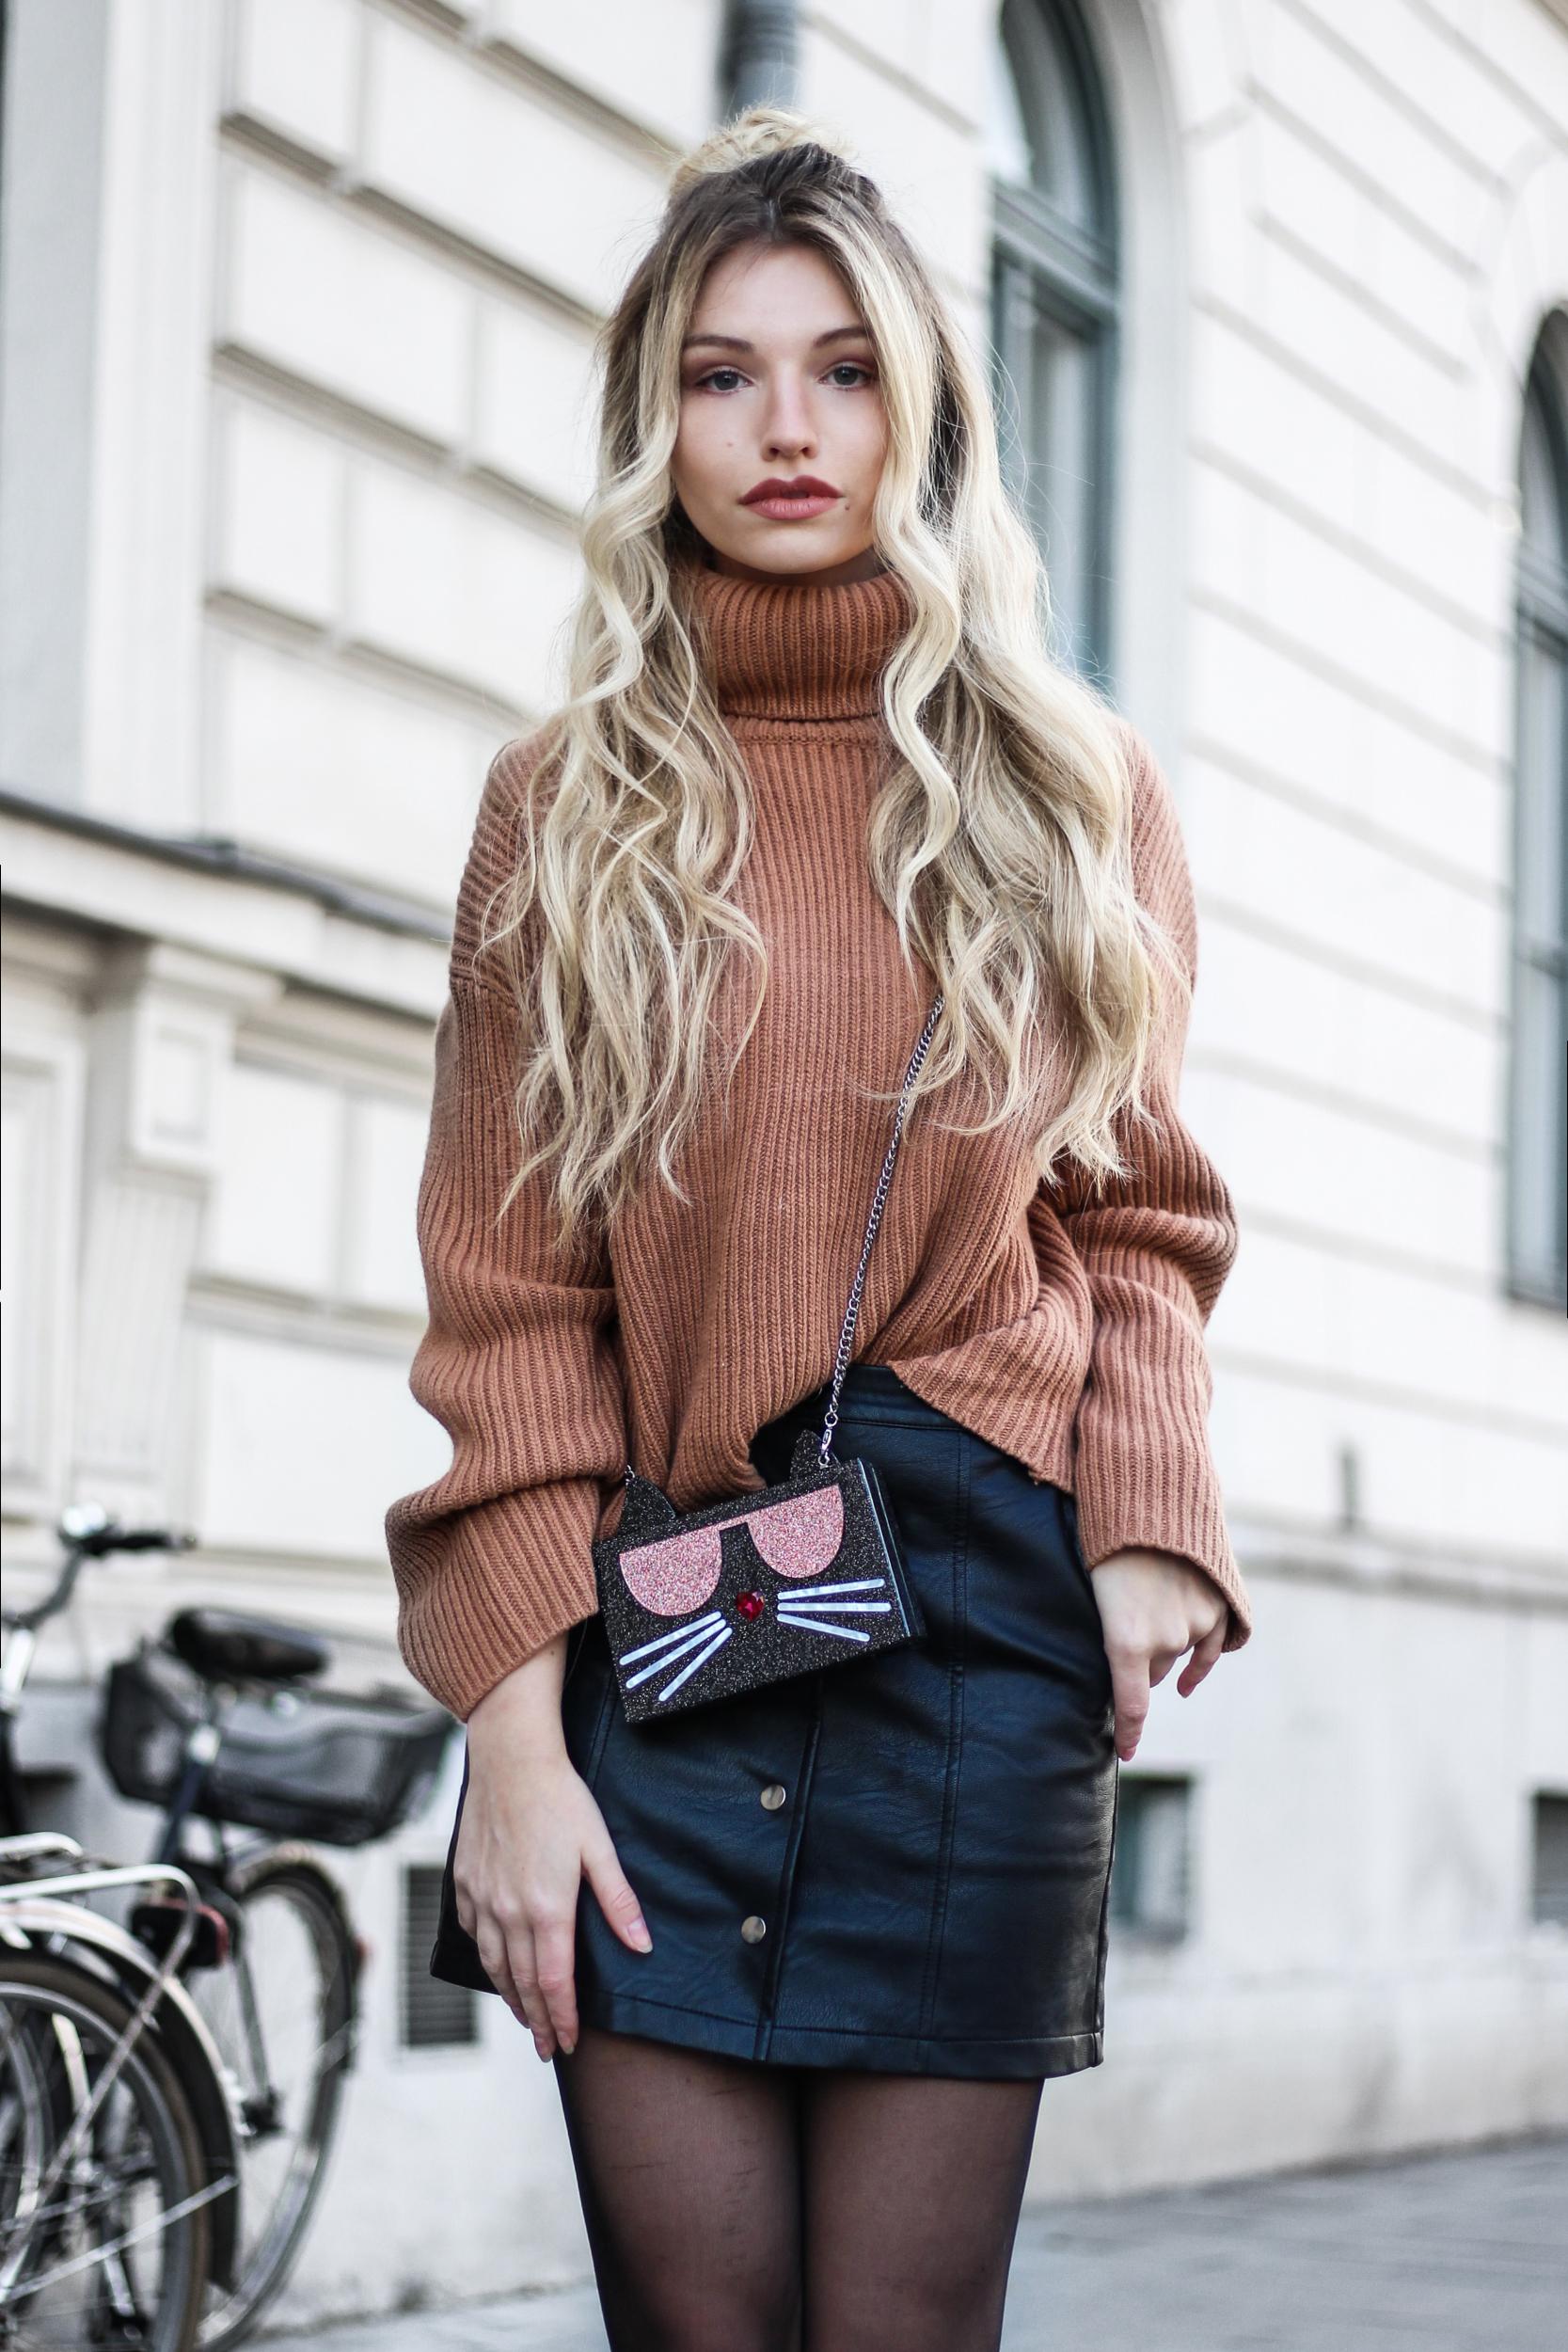 franziska-elea-blogger-aus-muenchen-fashionblog-mini-rock-herbst-outfit-fashionblogger-lederrock-rollkragen-pullover-chloe-lookalike-boots-nieten-lederboots